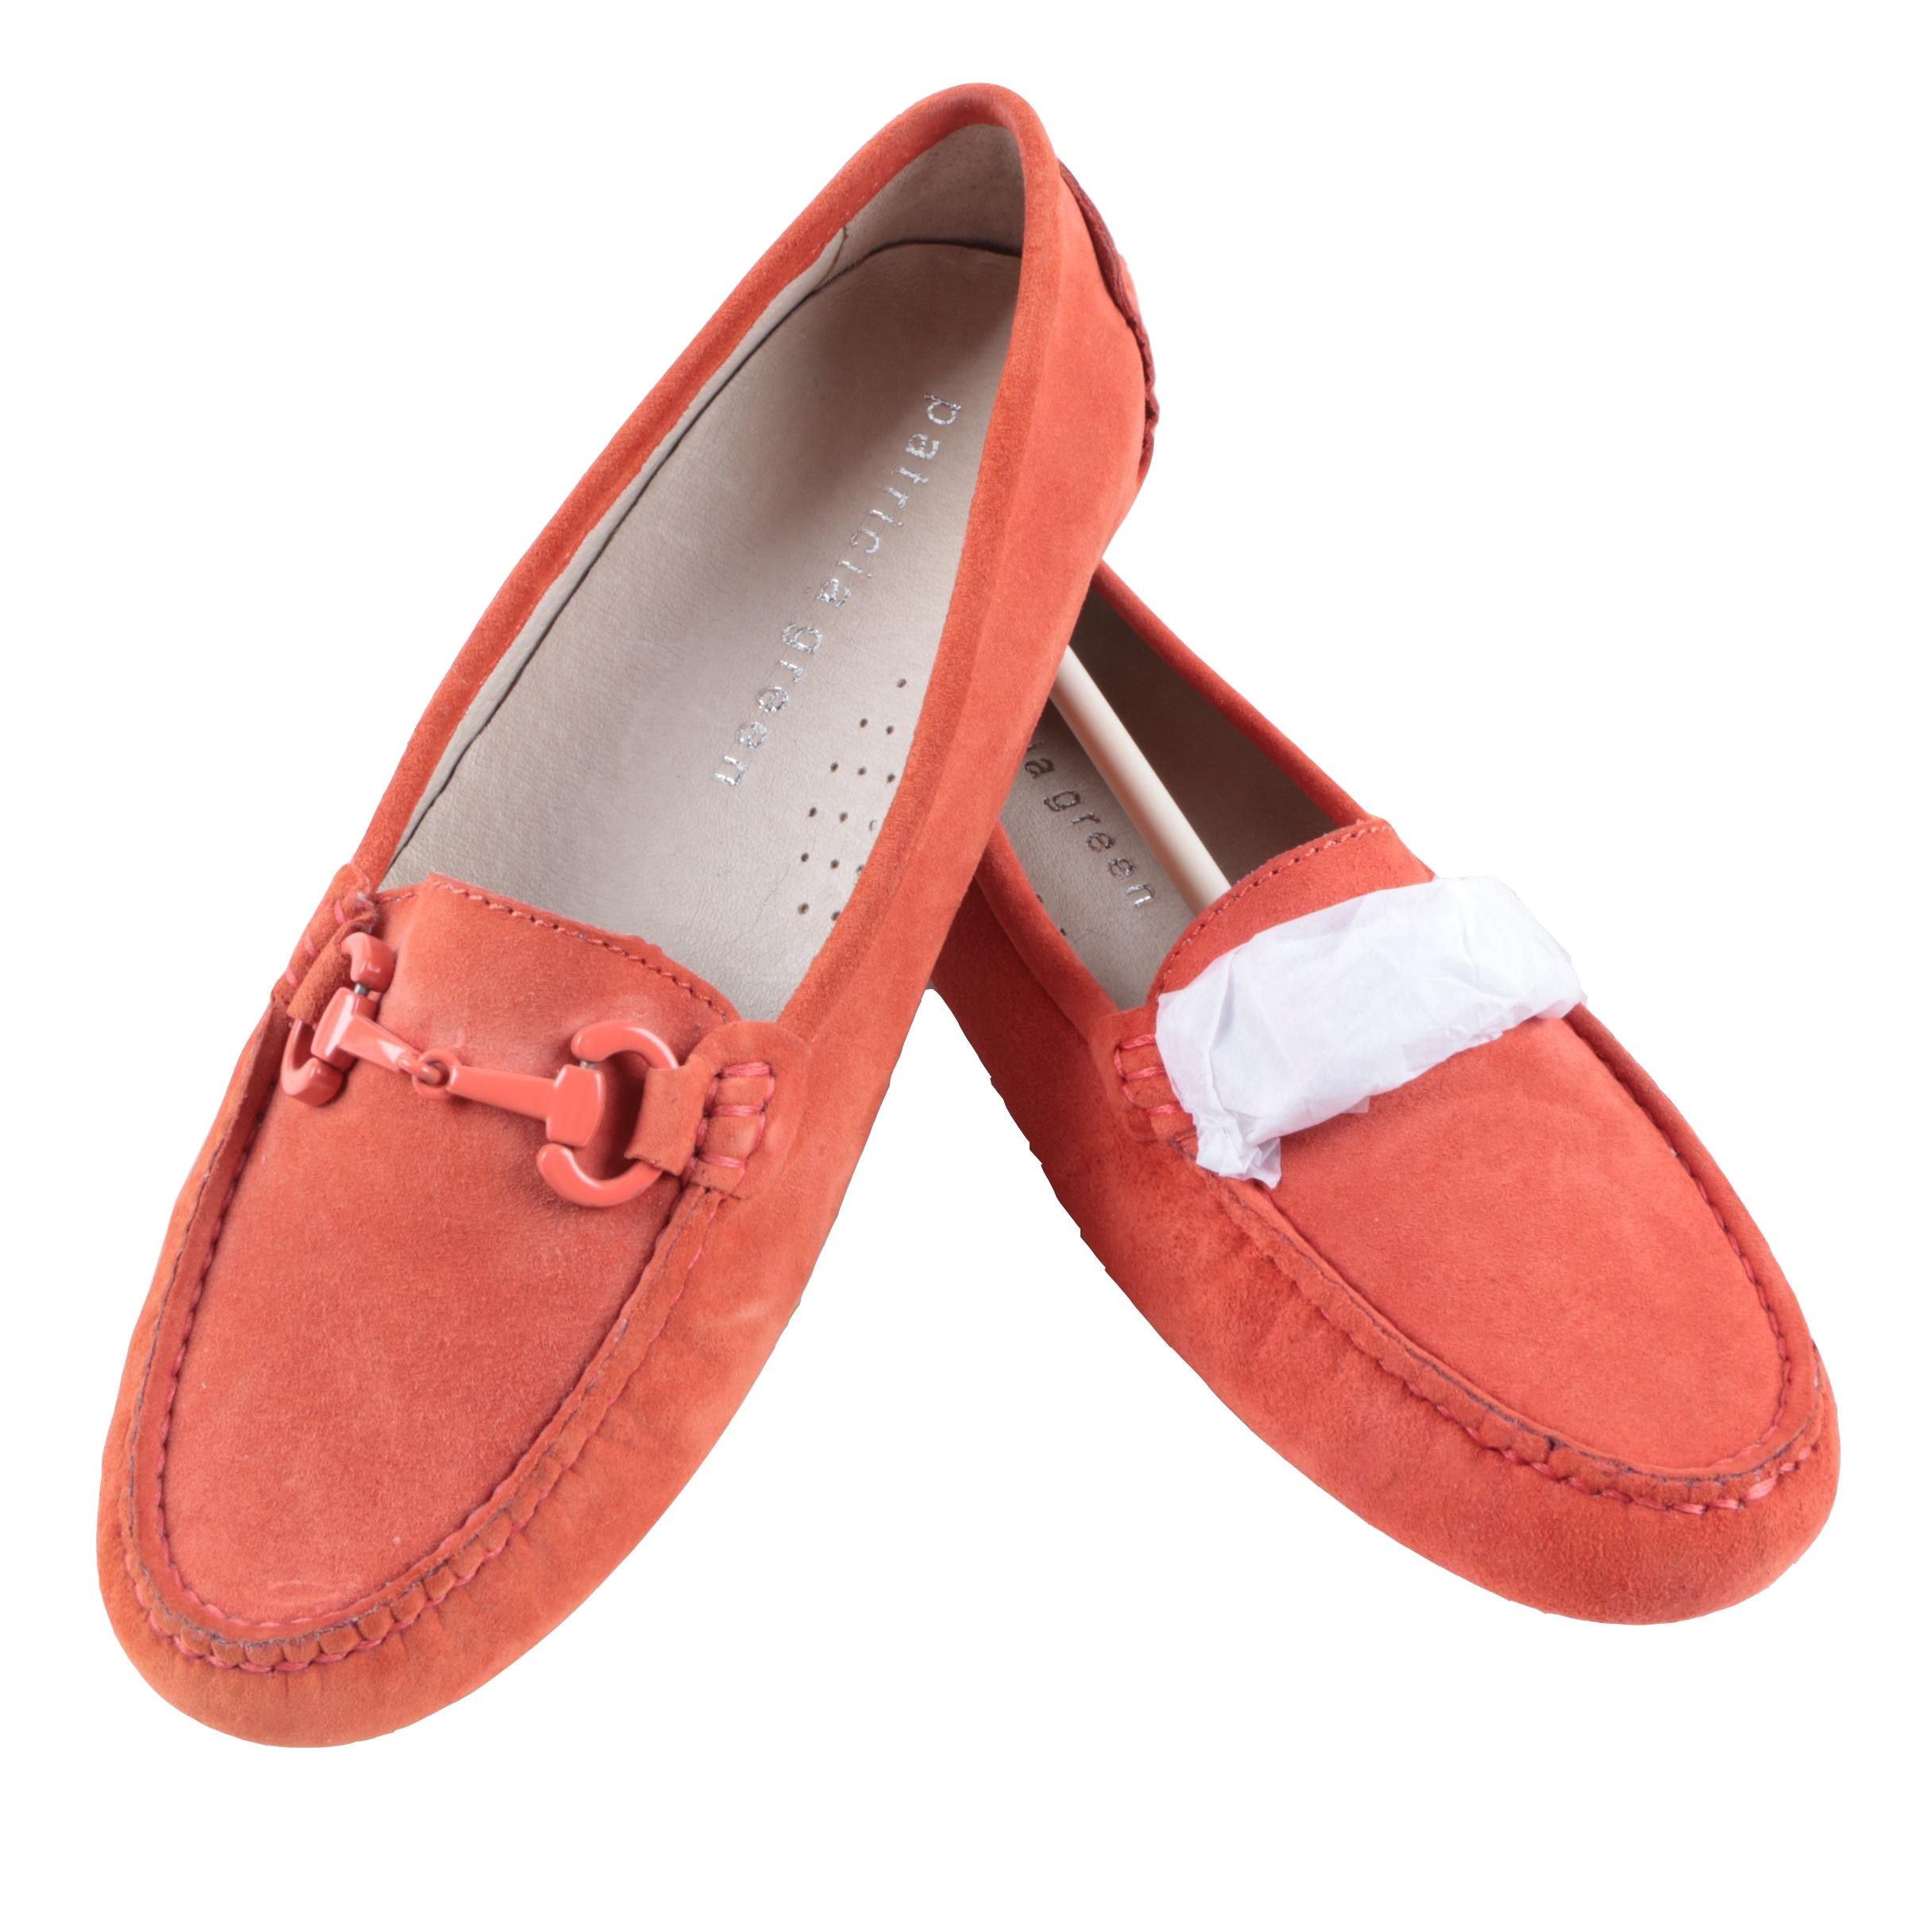 Patricia Green Cambridge Coral-Colored Suede Loafers